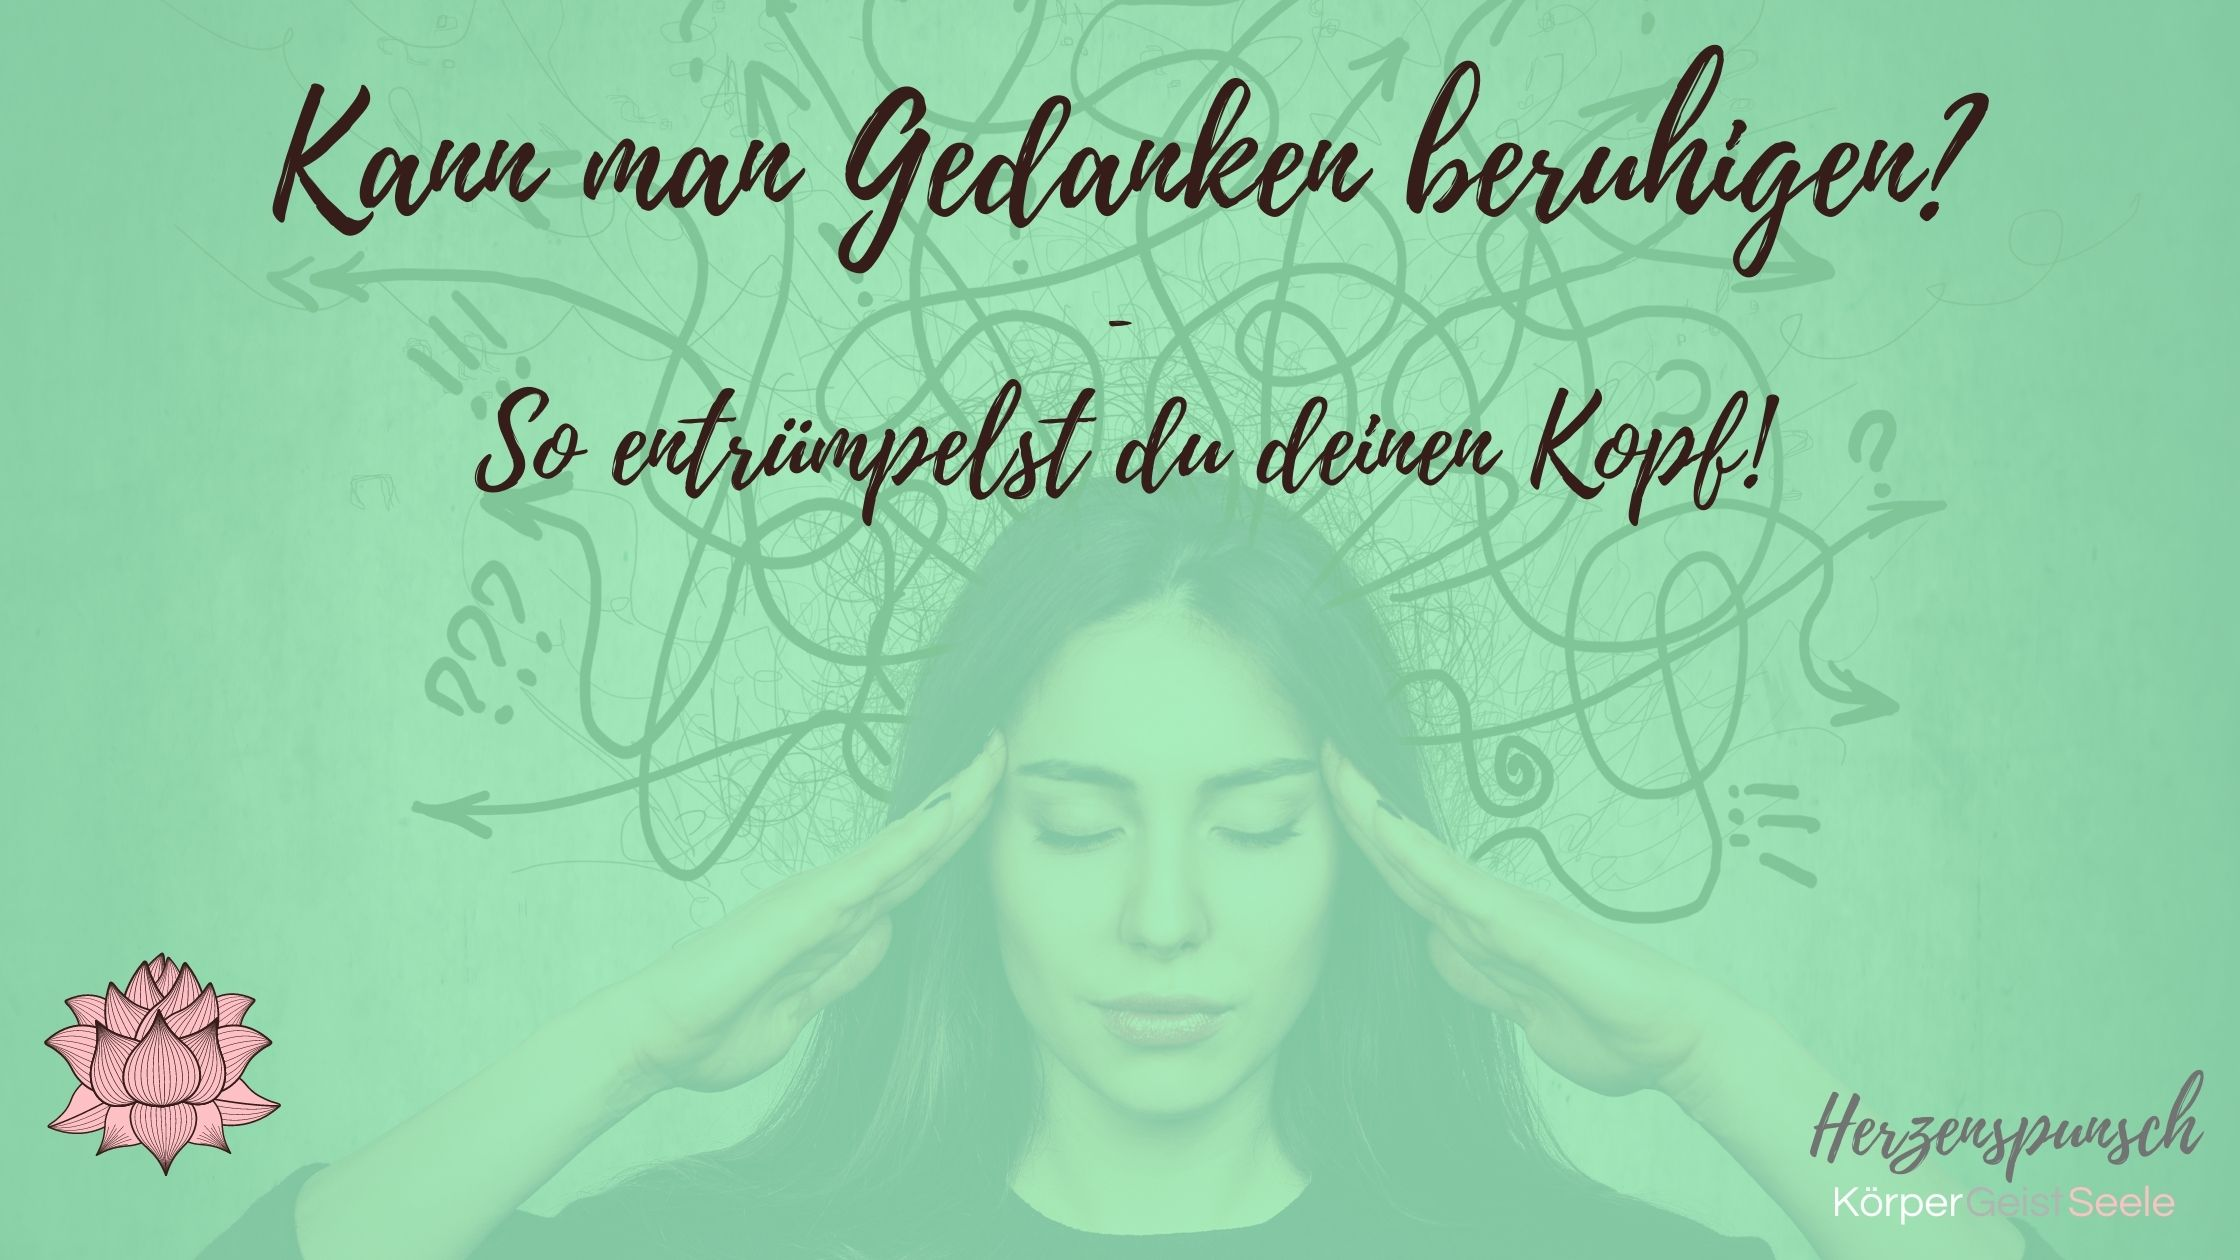 You are currently viewing Gedanken beruhigen? – so entrümpelst du deinen Kopf